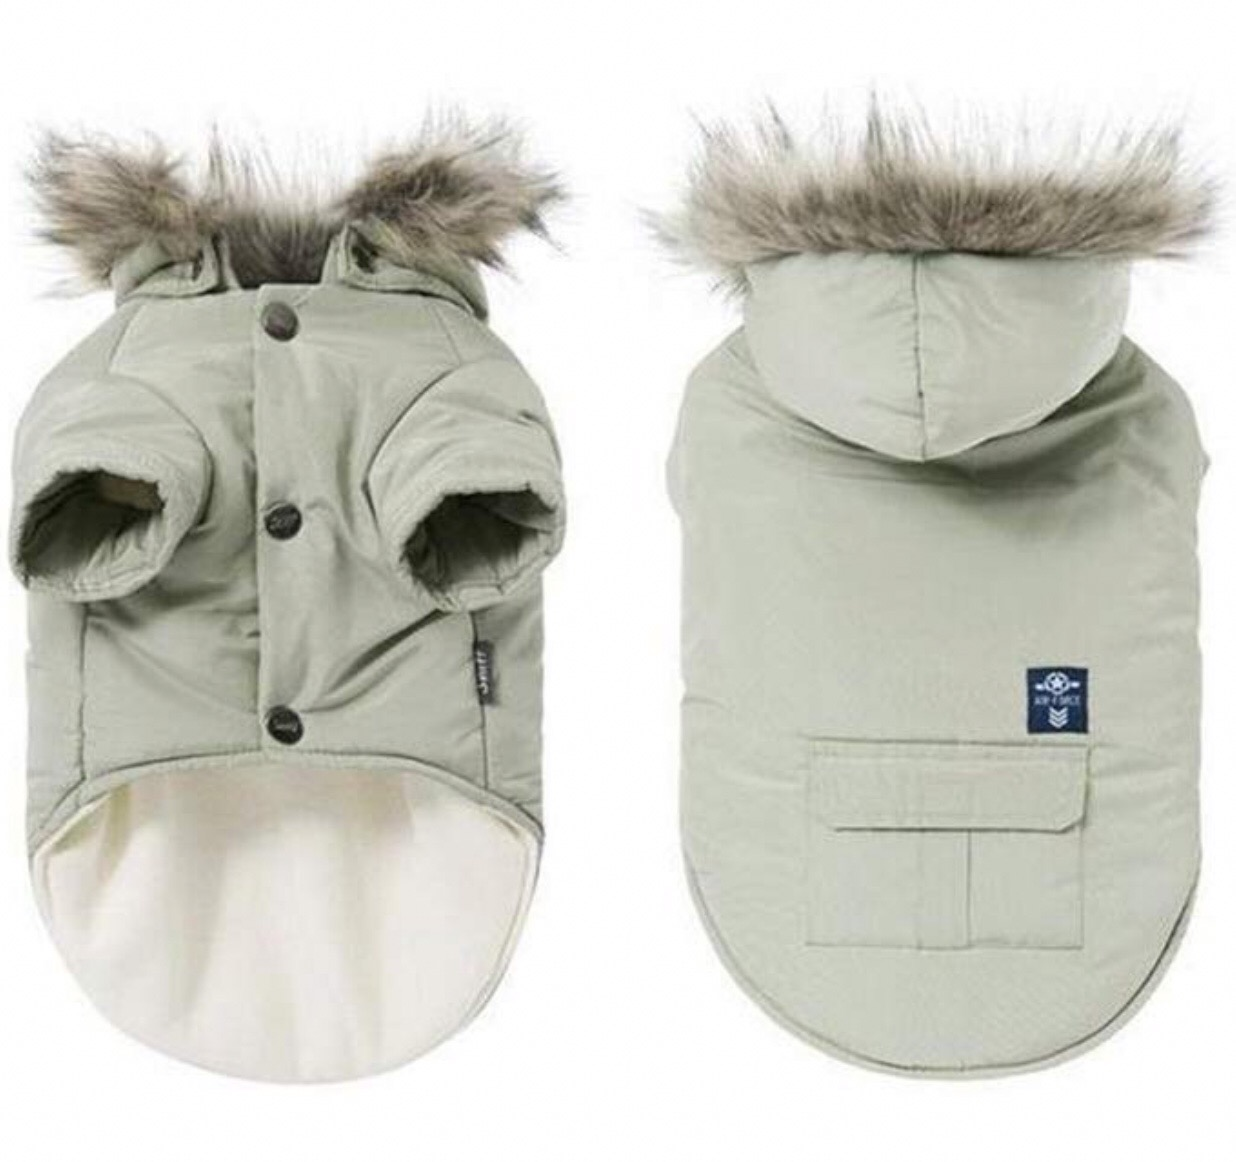 Chihuahua jackets 5